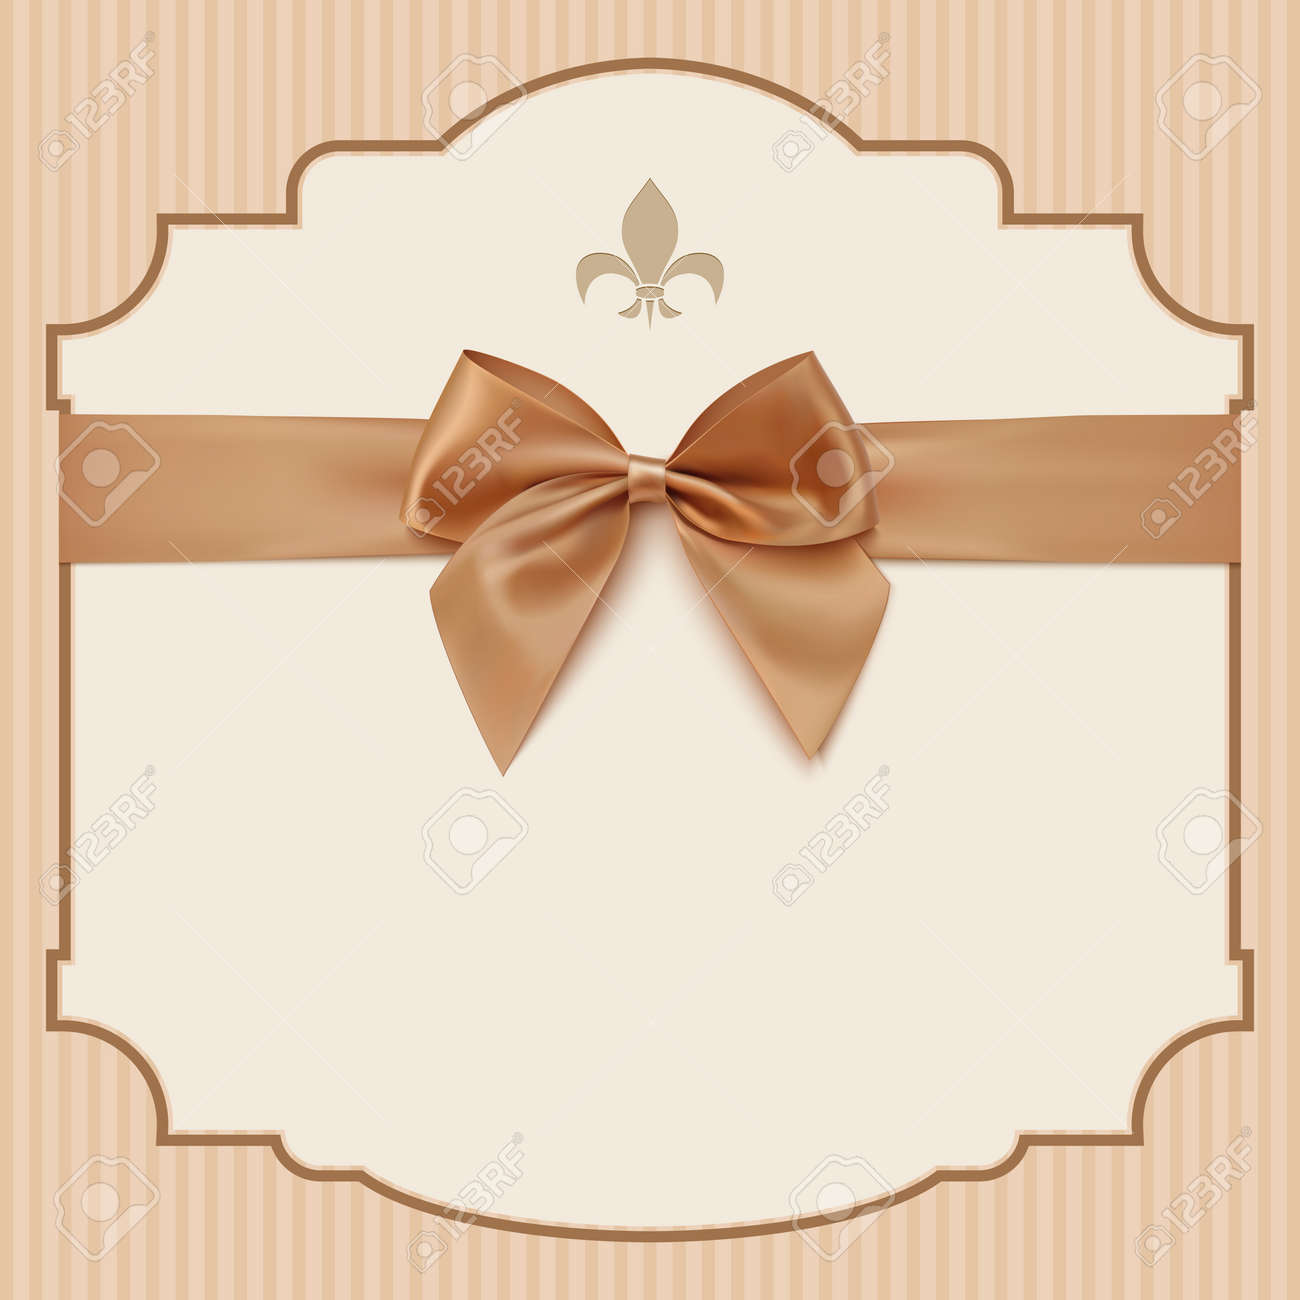 Bowwedding invitation card ntage greeting card template with bowwedding invitation card ntage greeting card template with golden bow and ribbon vector illustration stopboris Gallery